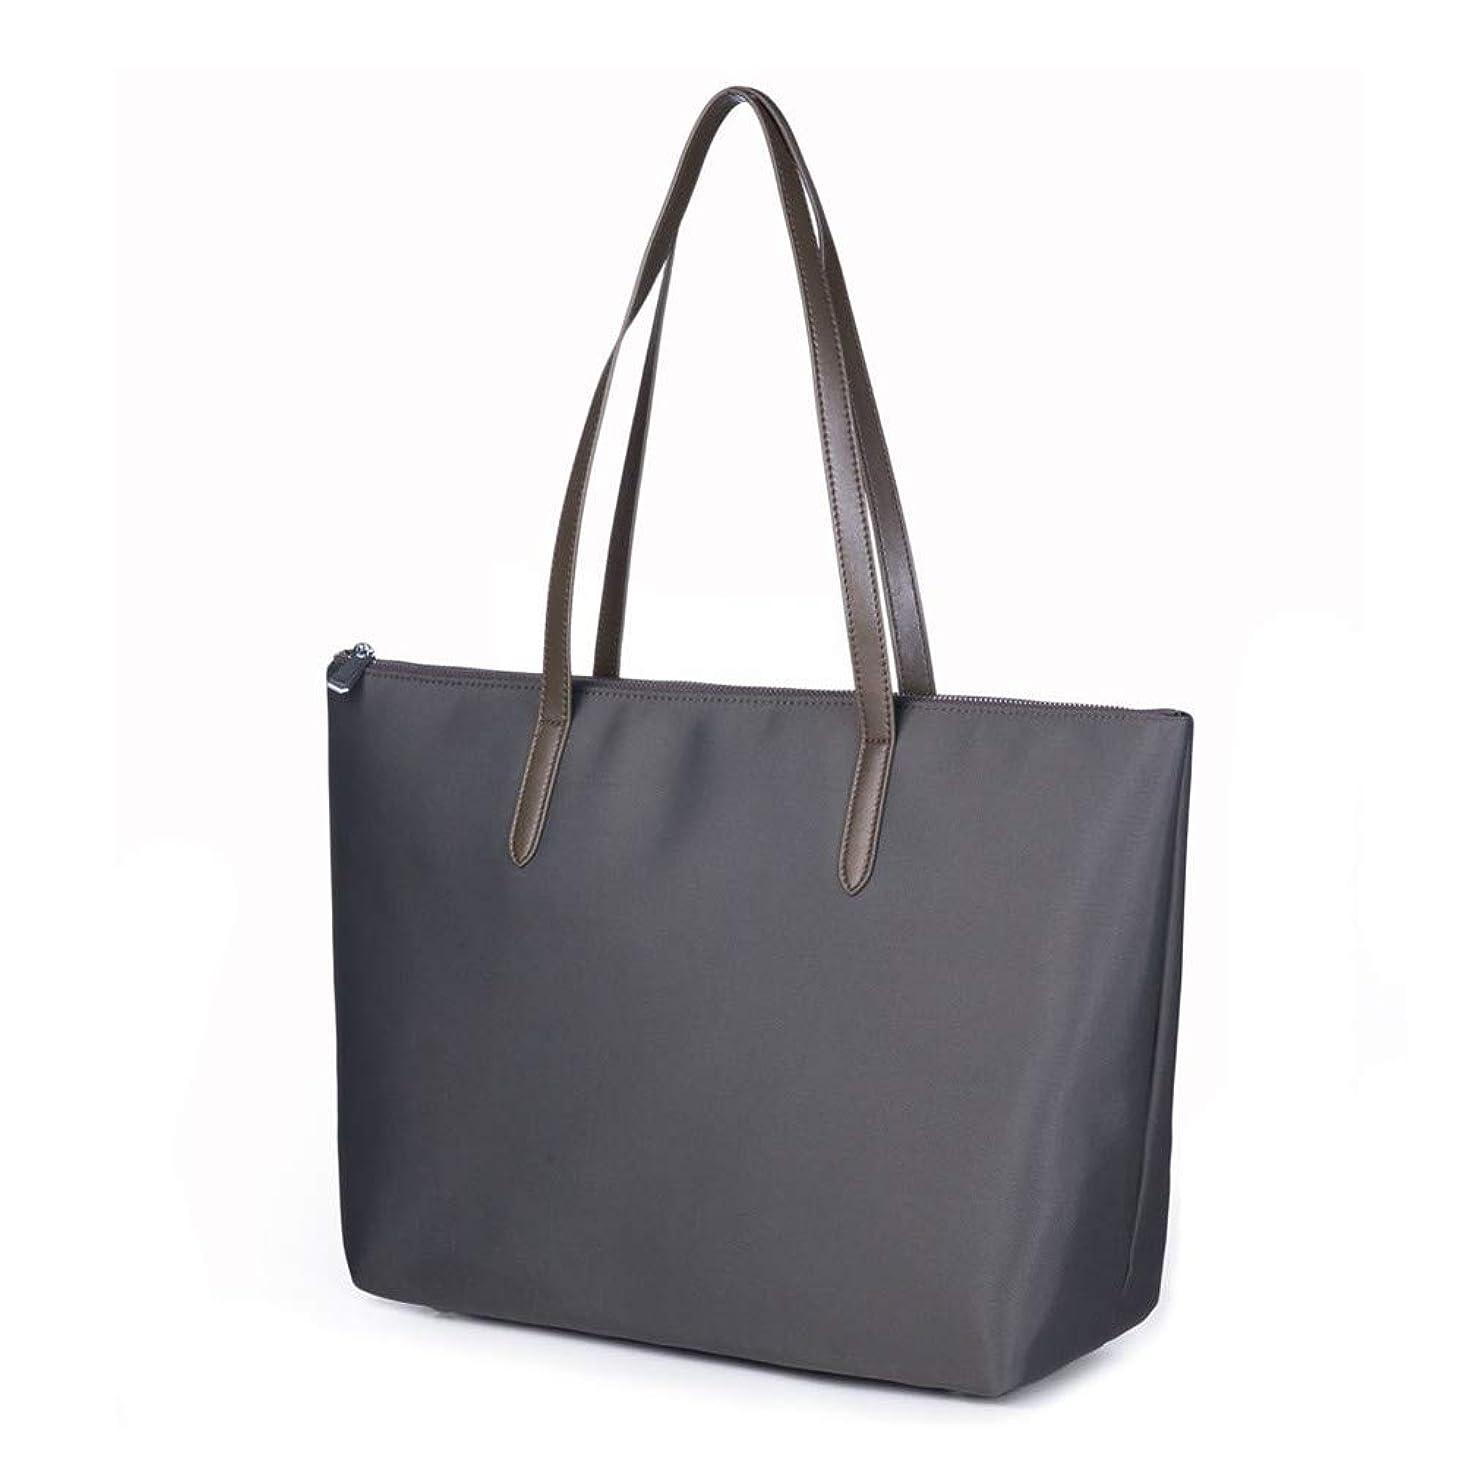 Lecxci Women's Satchel Large Capacity Waterproof Tote Bag Oxford Nylon Shoulder Handbags for Office Lady